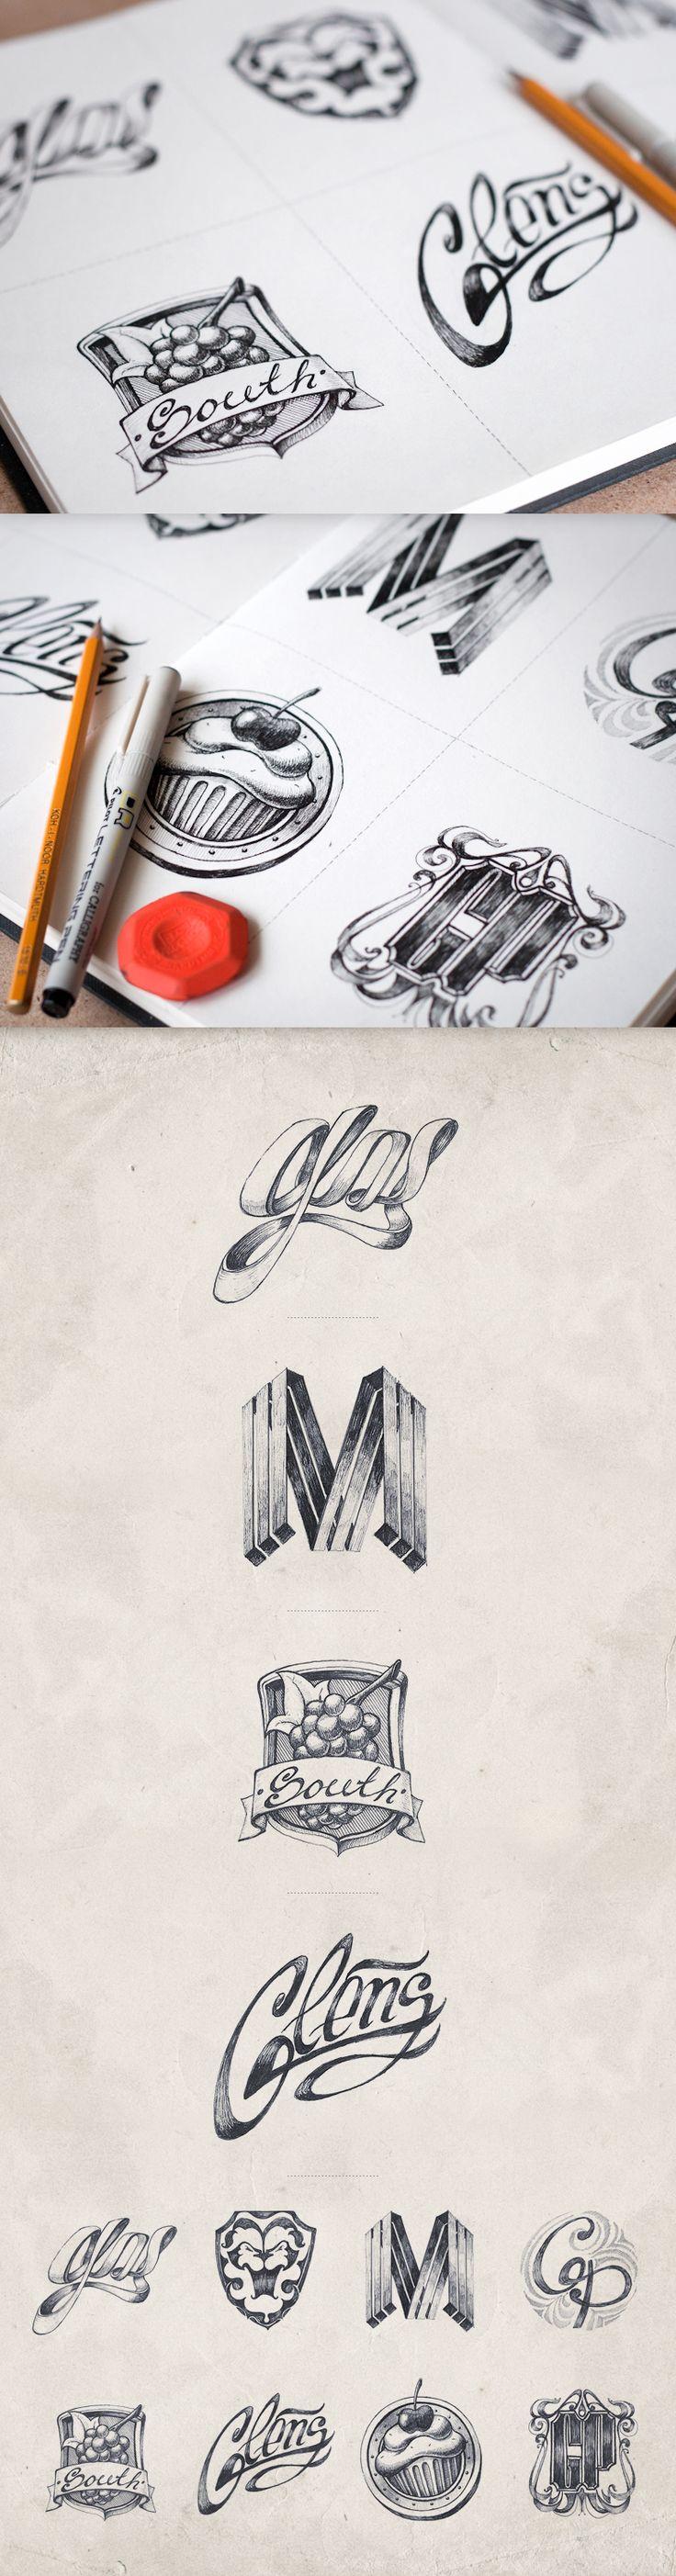 Hand Drawn Logos. Dream. Logo logotipo dibujo mano , desenho mao